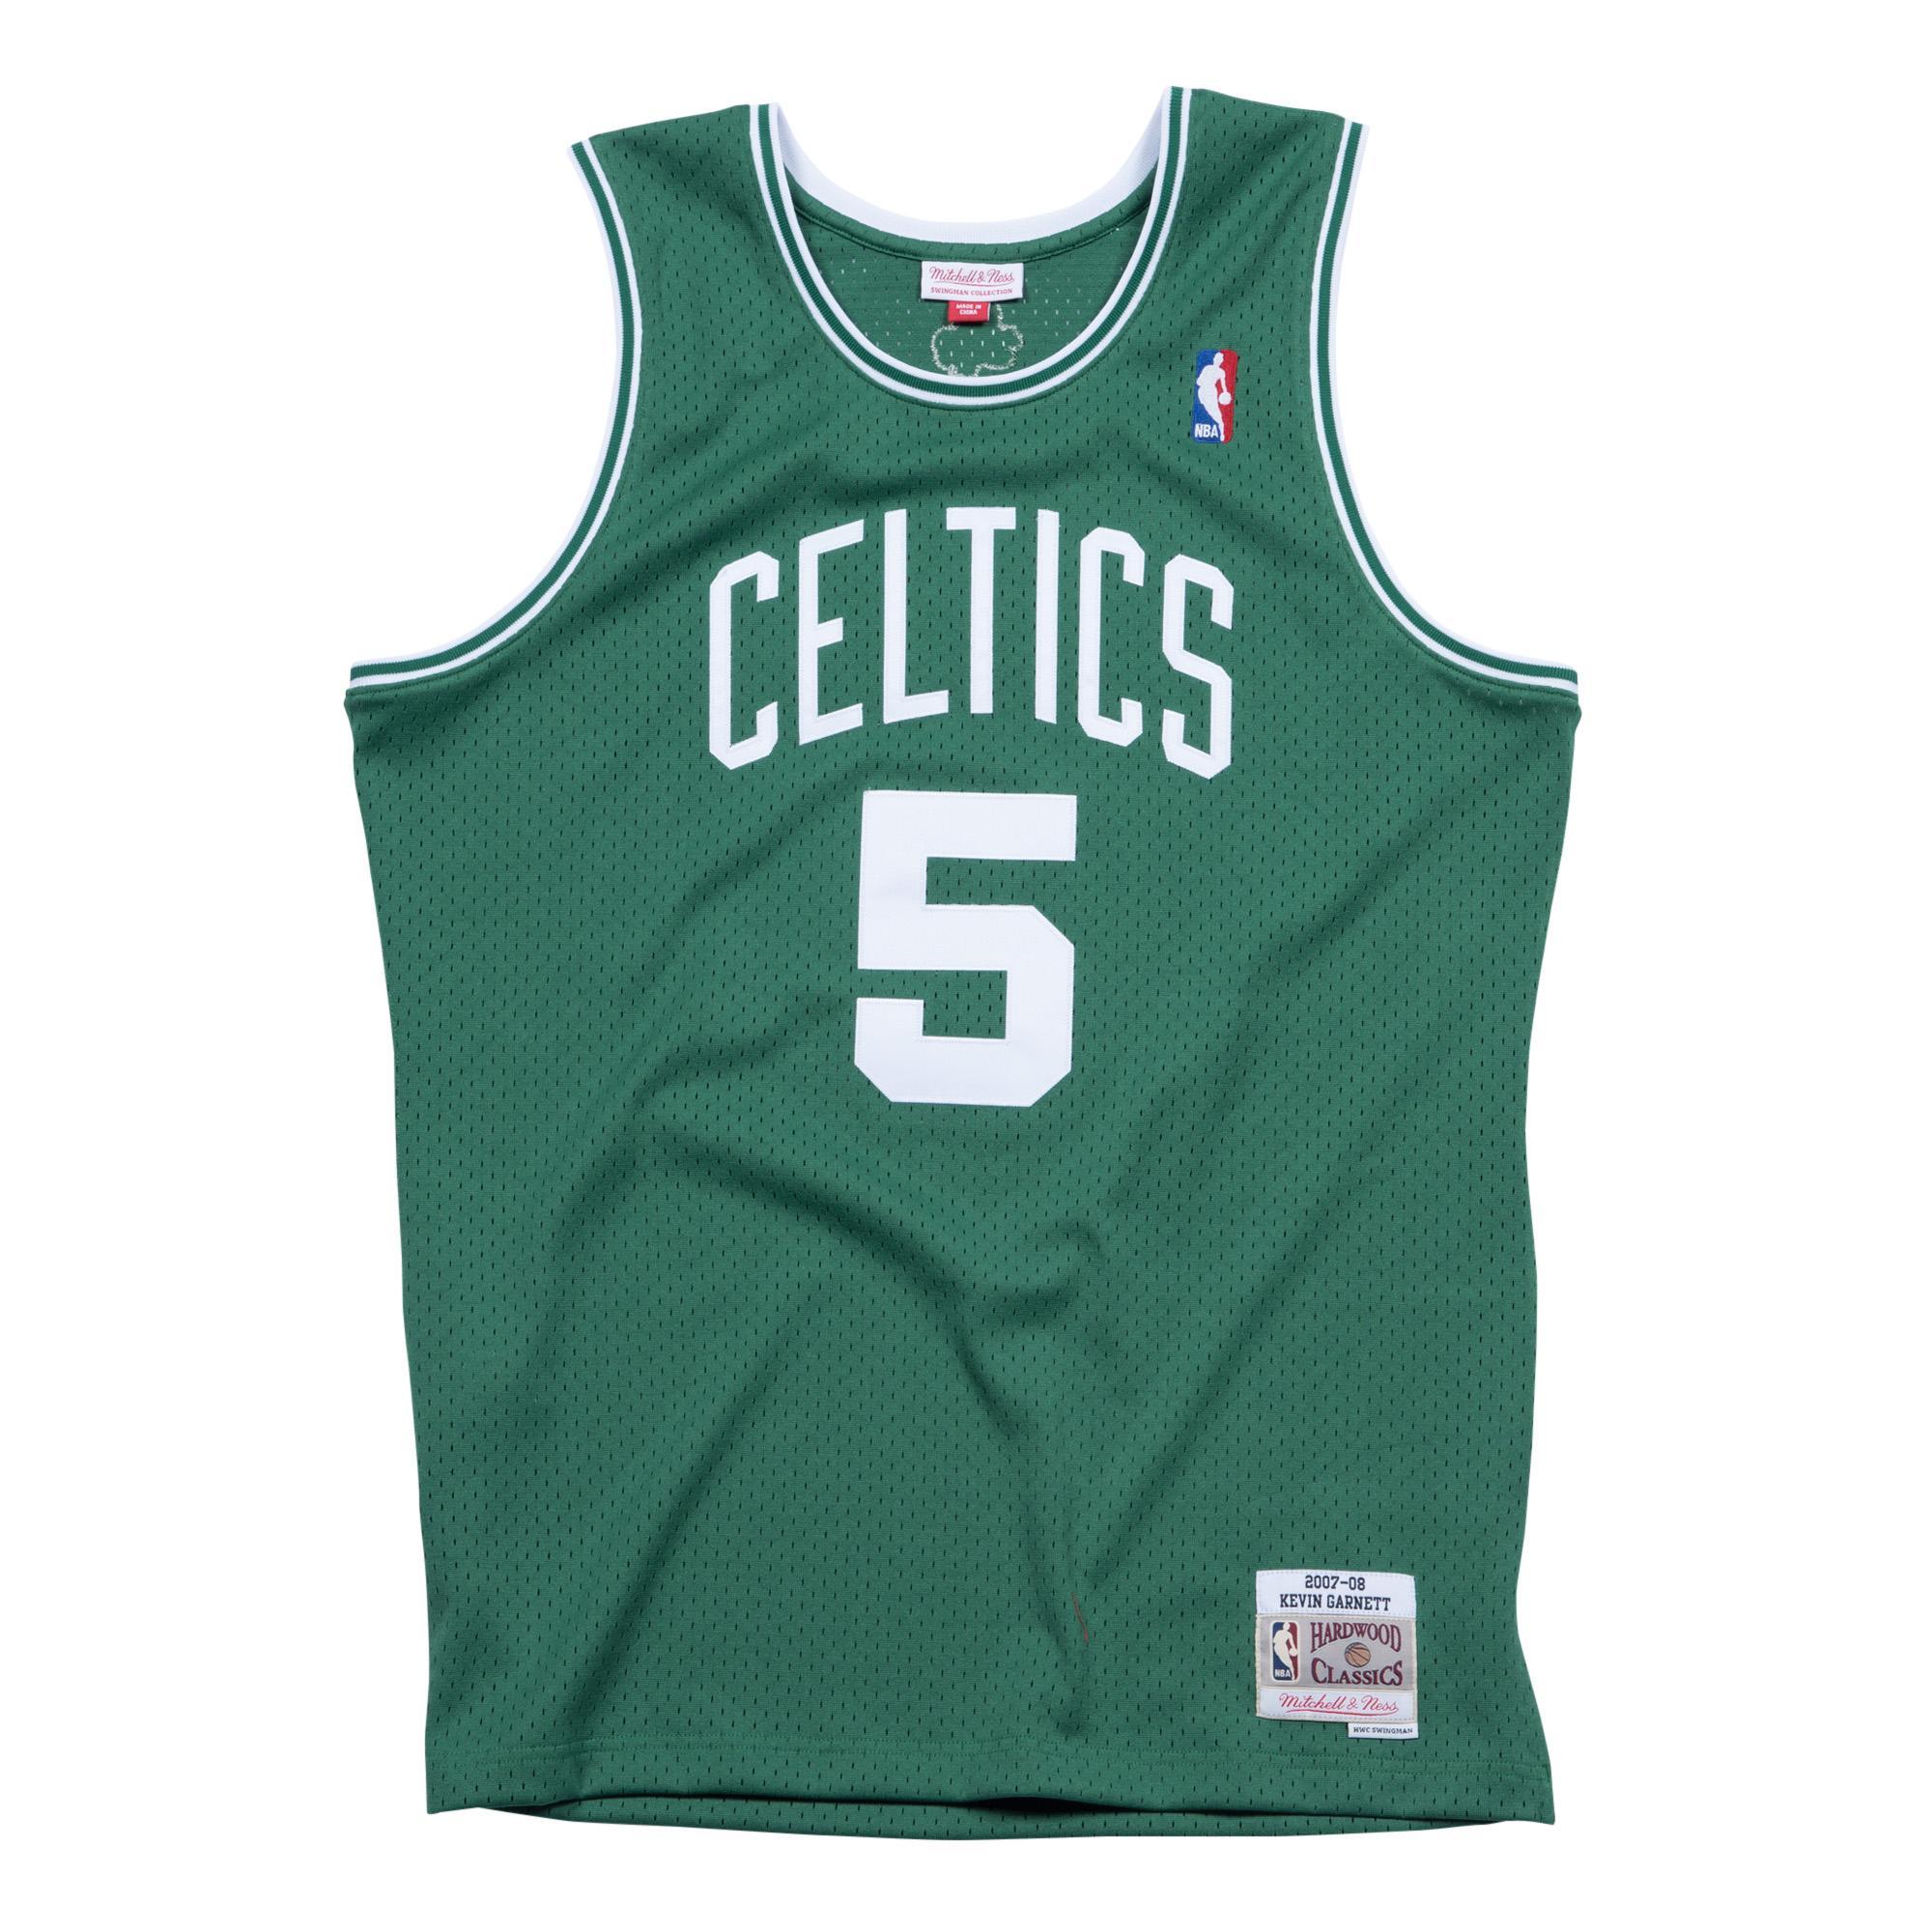 ca6976f5a Kevin Garnett 2007-08 Swingman Jersey Boston Celtics